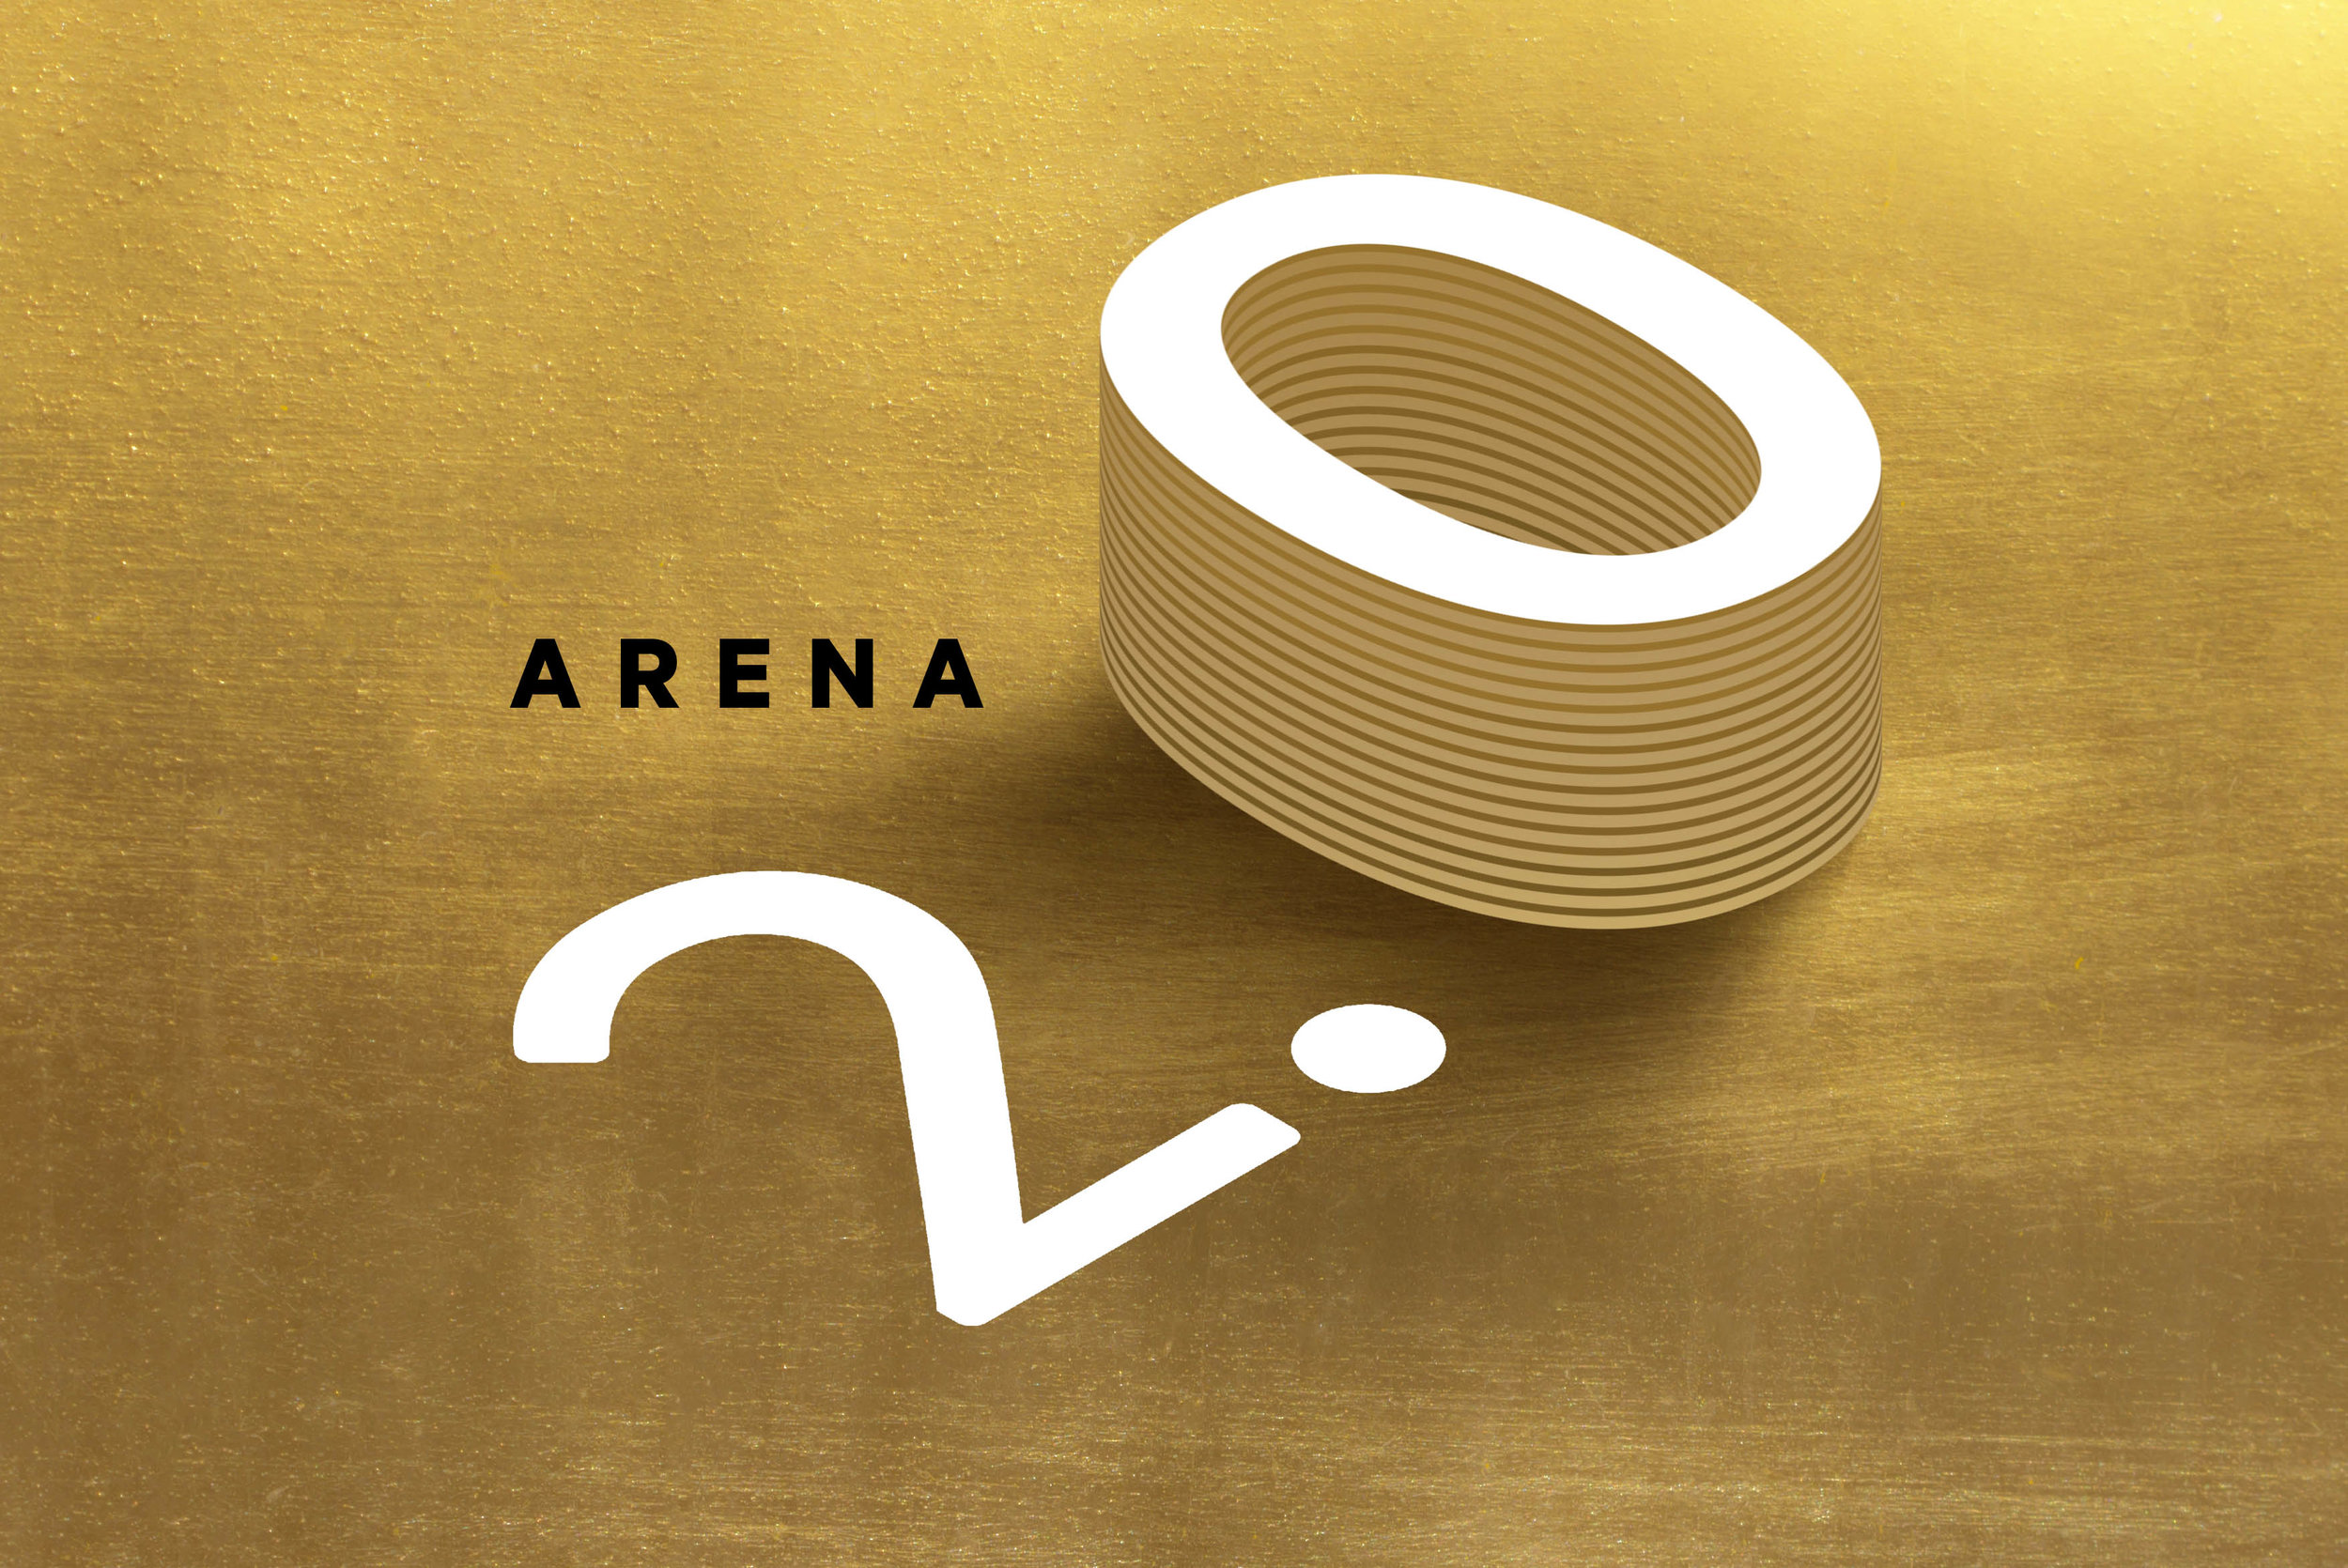 arena_2.0.jpg